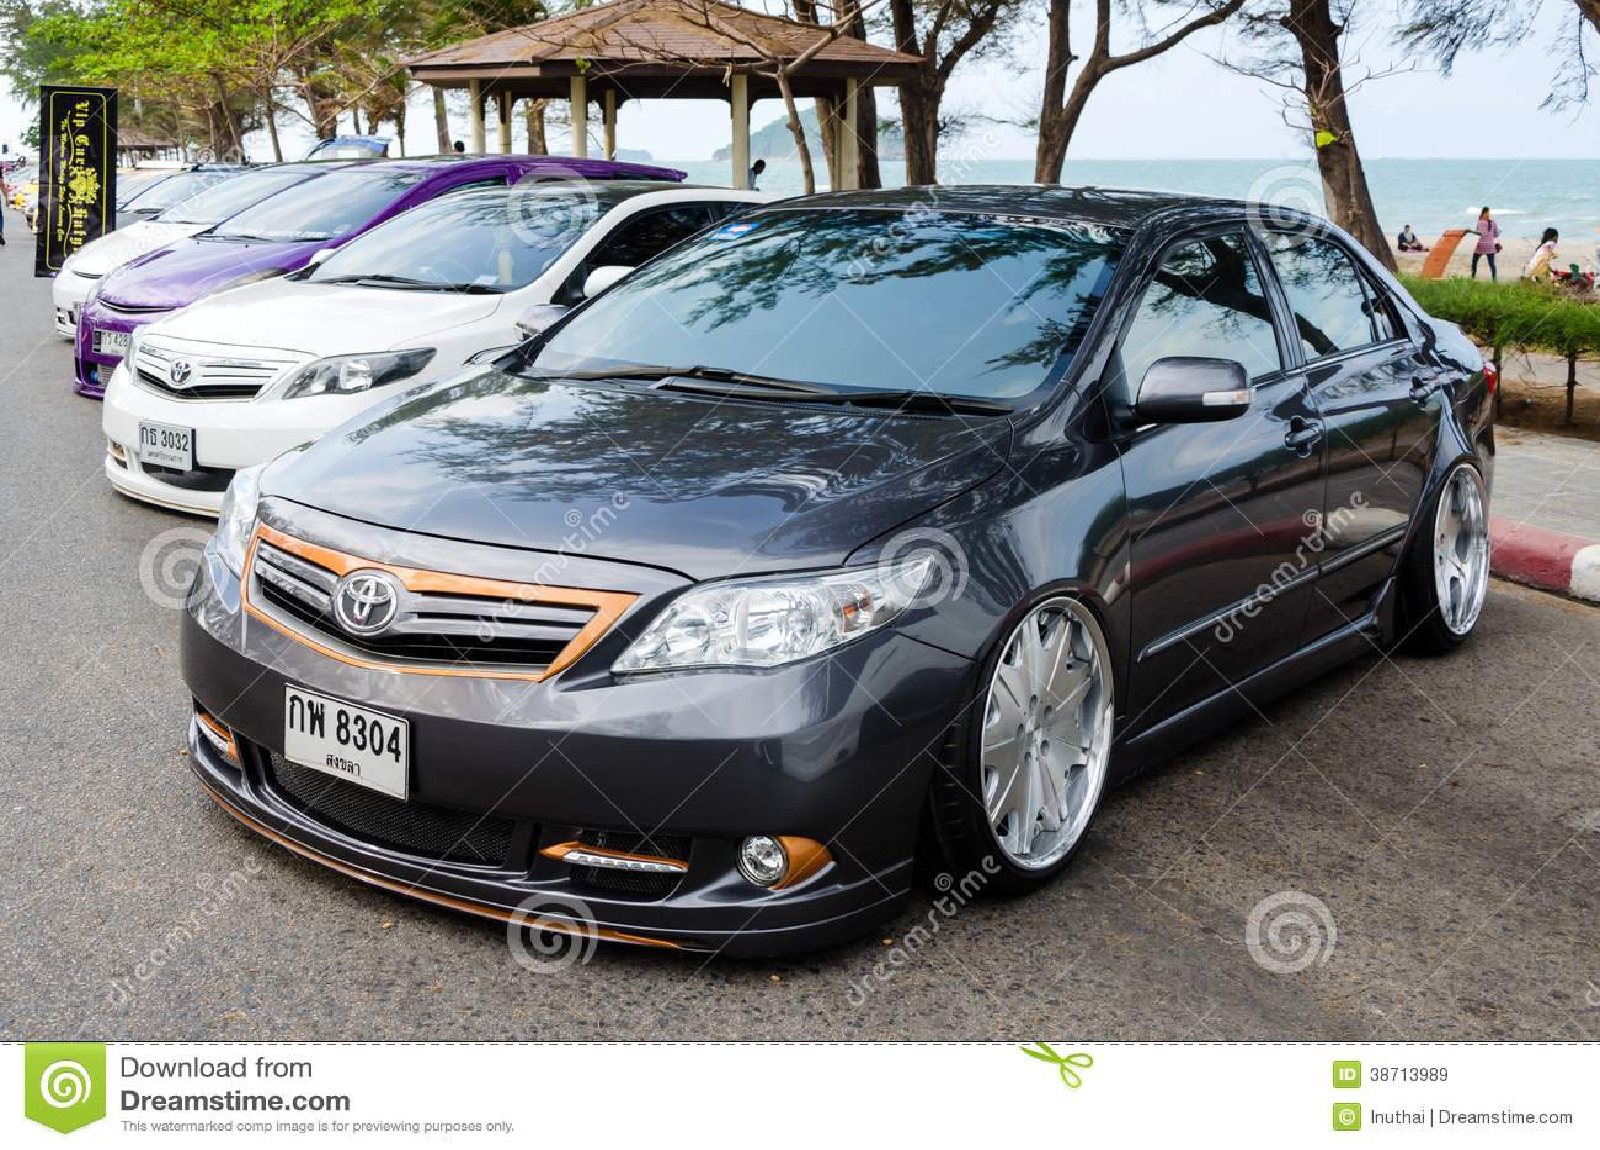 Toyota Chr Philippines >> Tuned Car Toyota Corolla Altis Editorial Stock Image ...